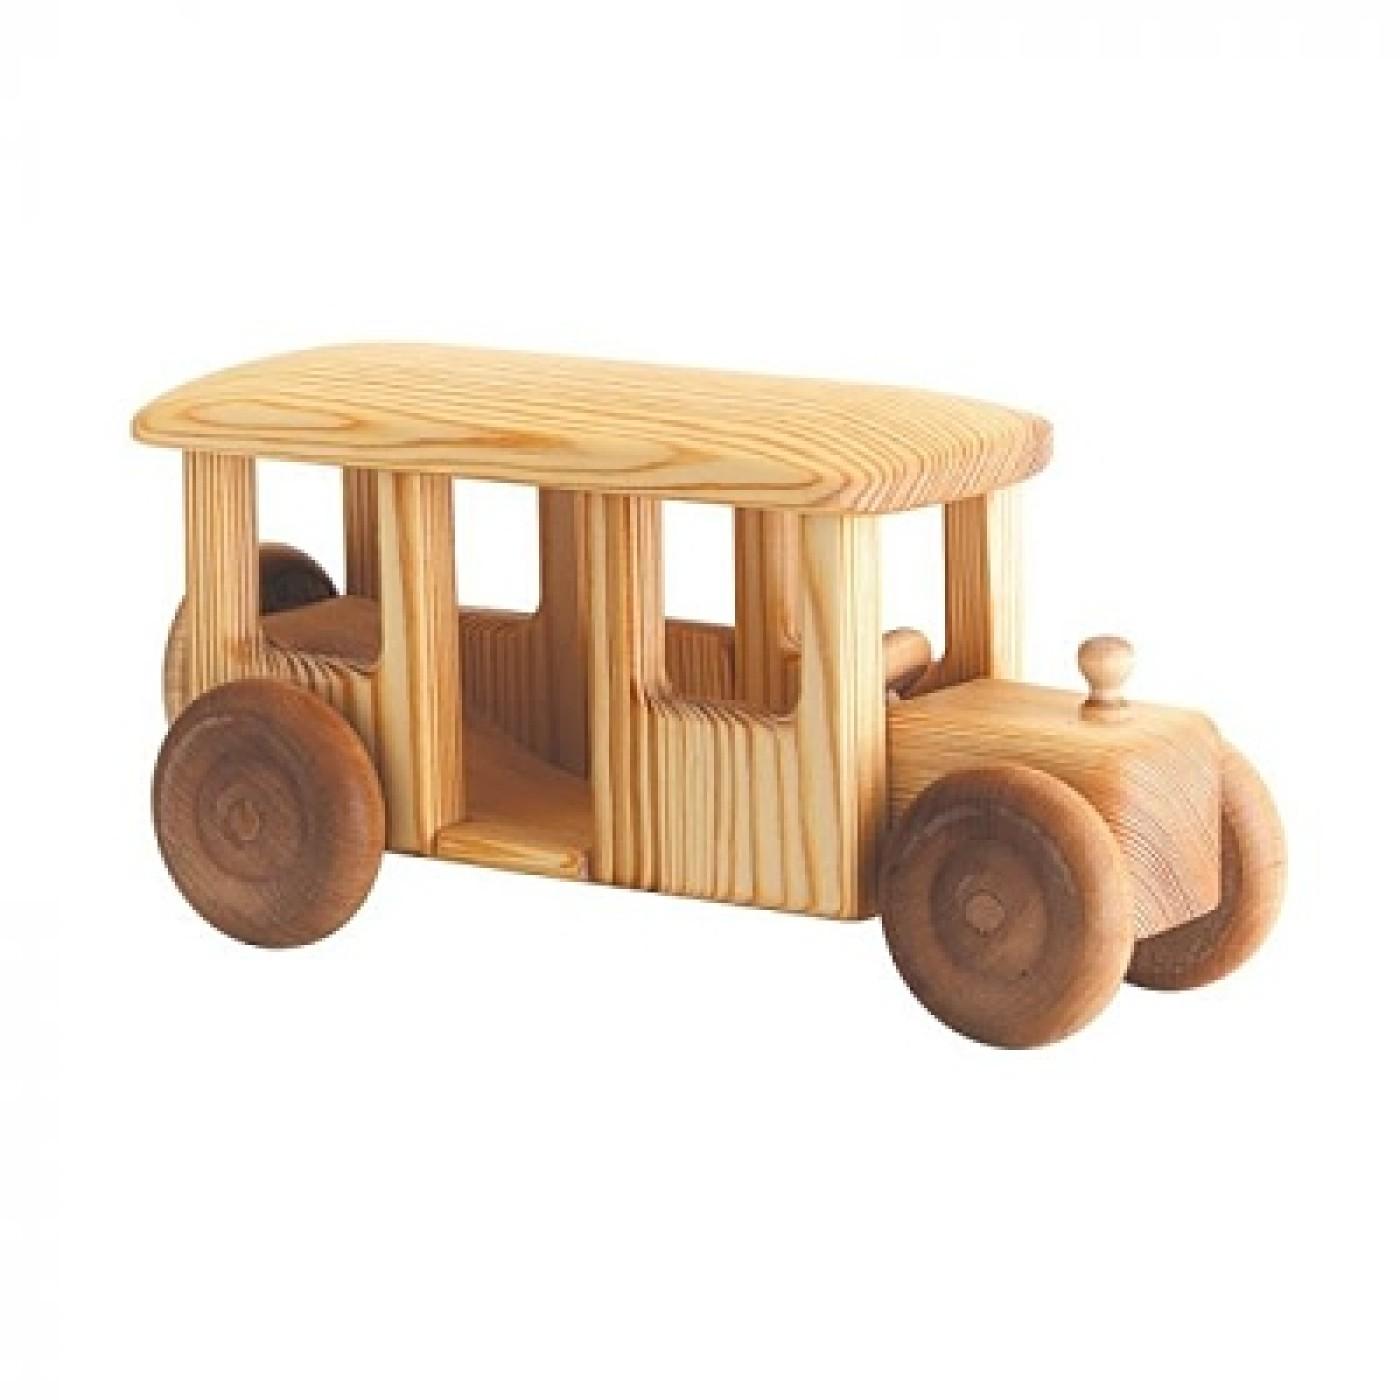 Debresk Wooden Toy Omnibus